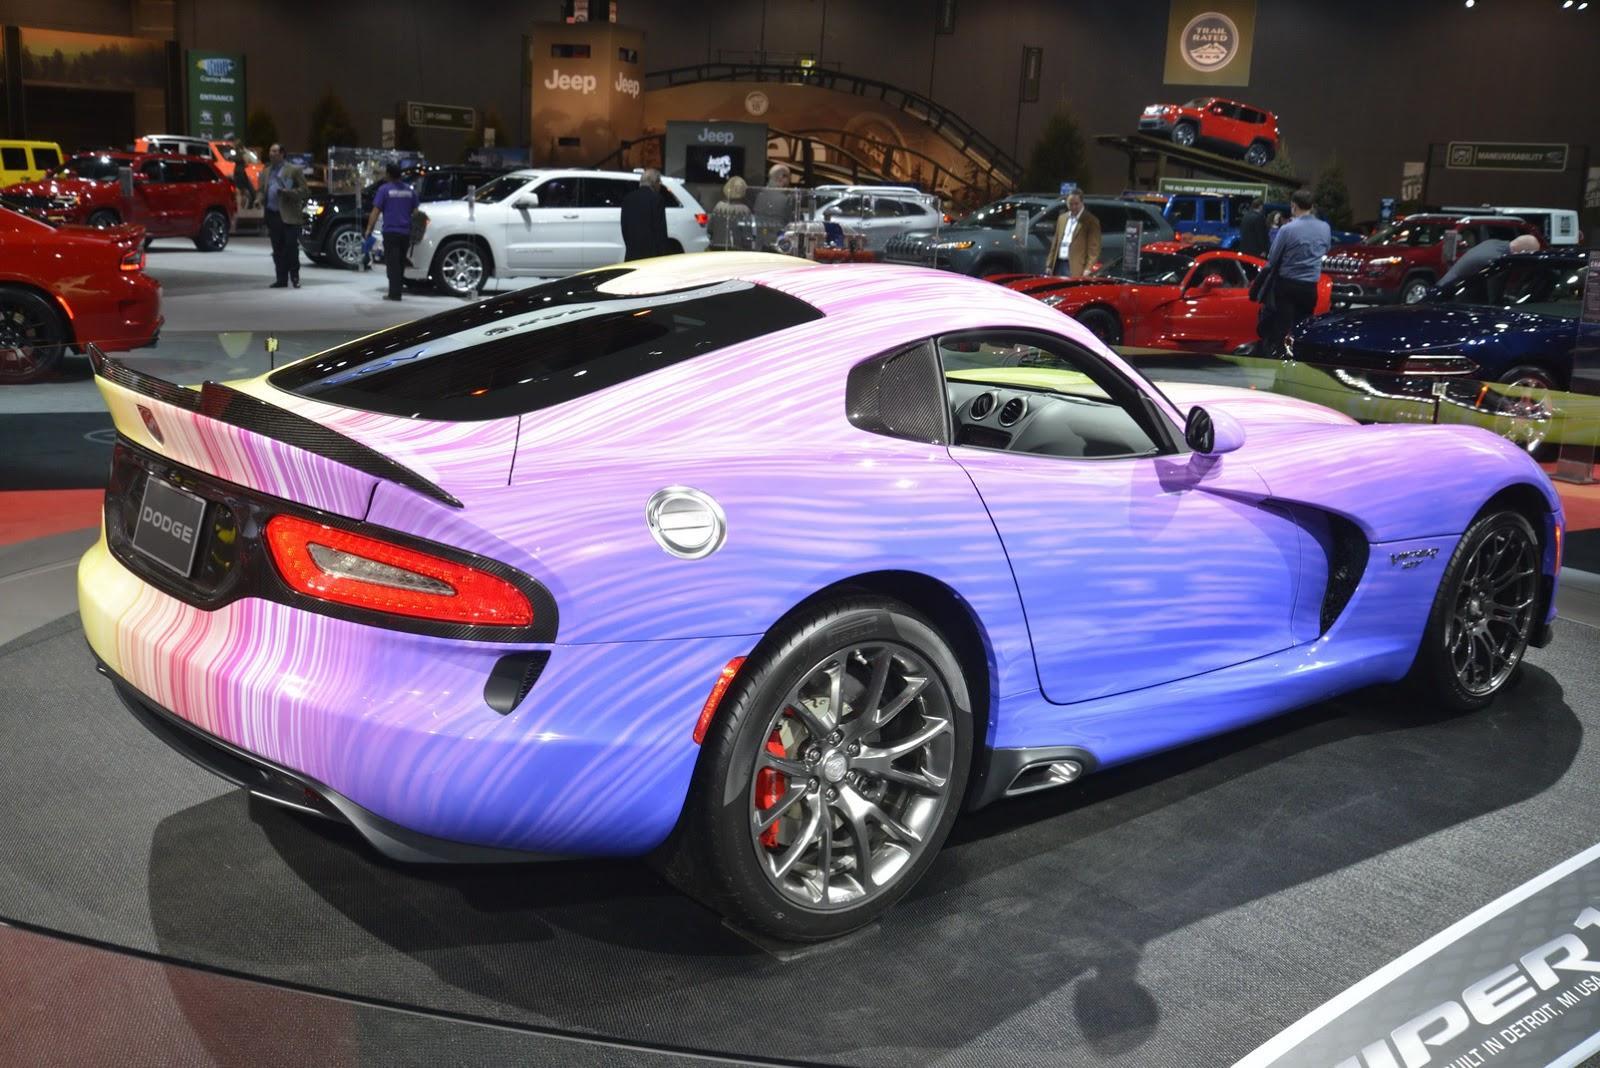 Dodge Viper 1 of 1